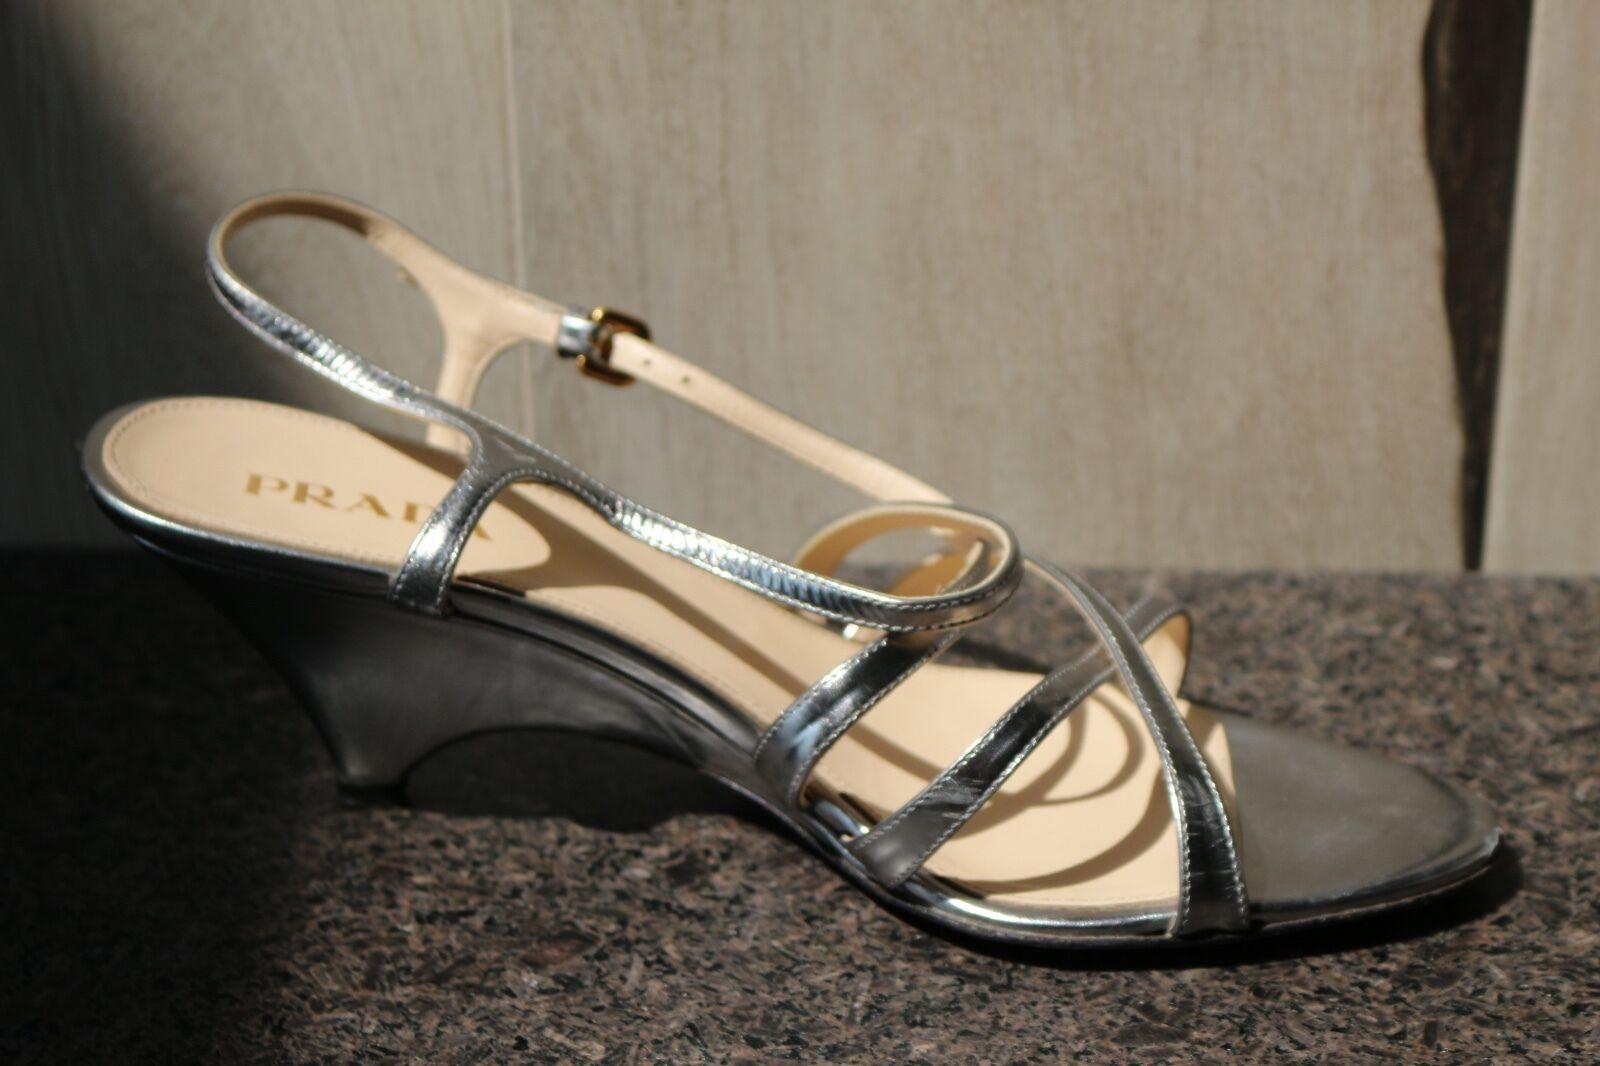 PRADA platformwedge Sandales Bout Ouvert Chaussures 39.5